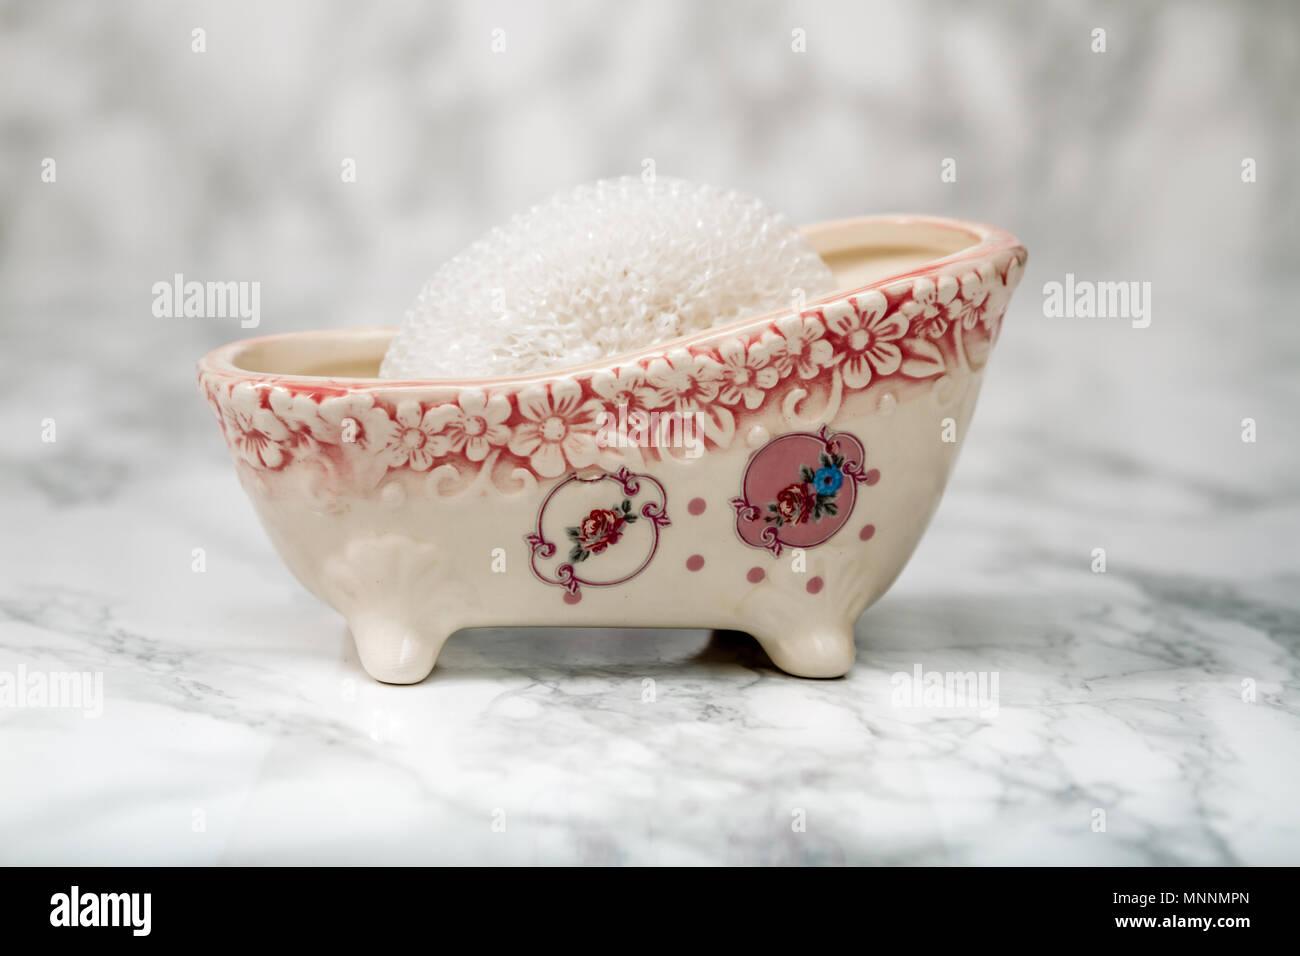 Decorative ceramic mini claw foot bathtub soap dish with bath sponge ...